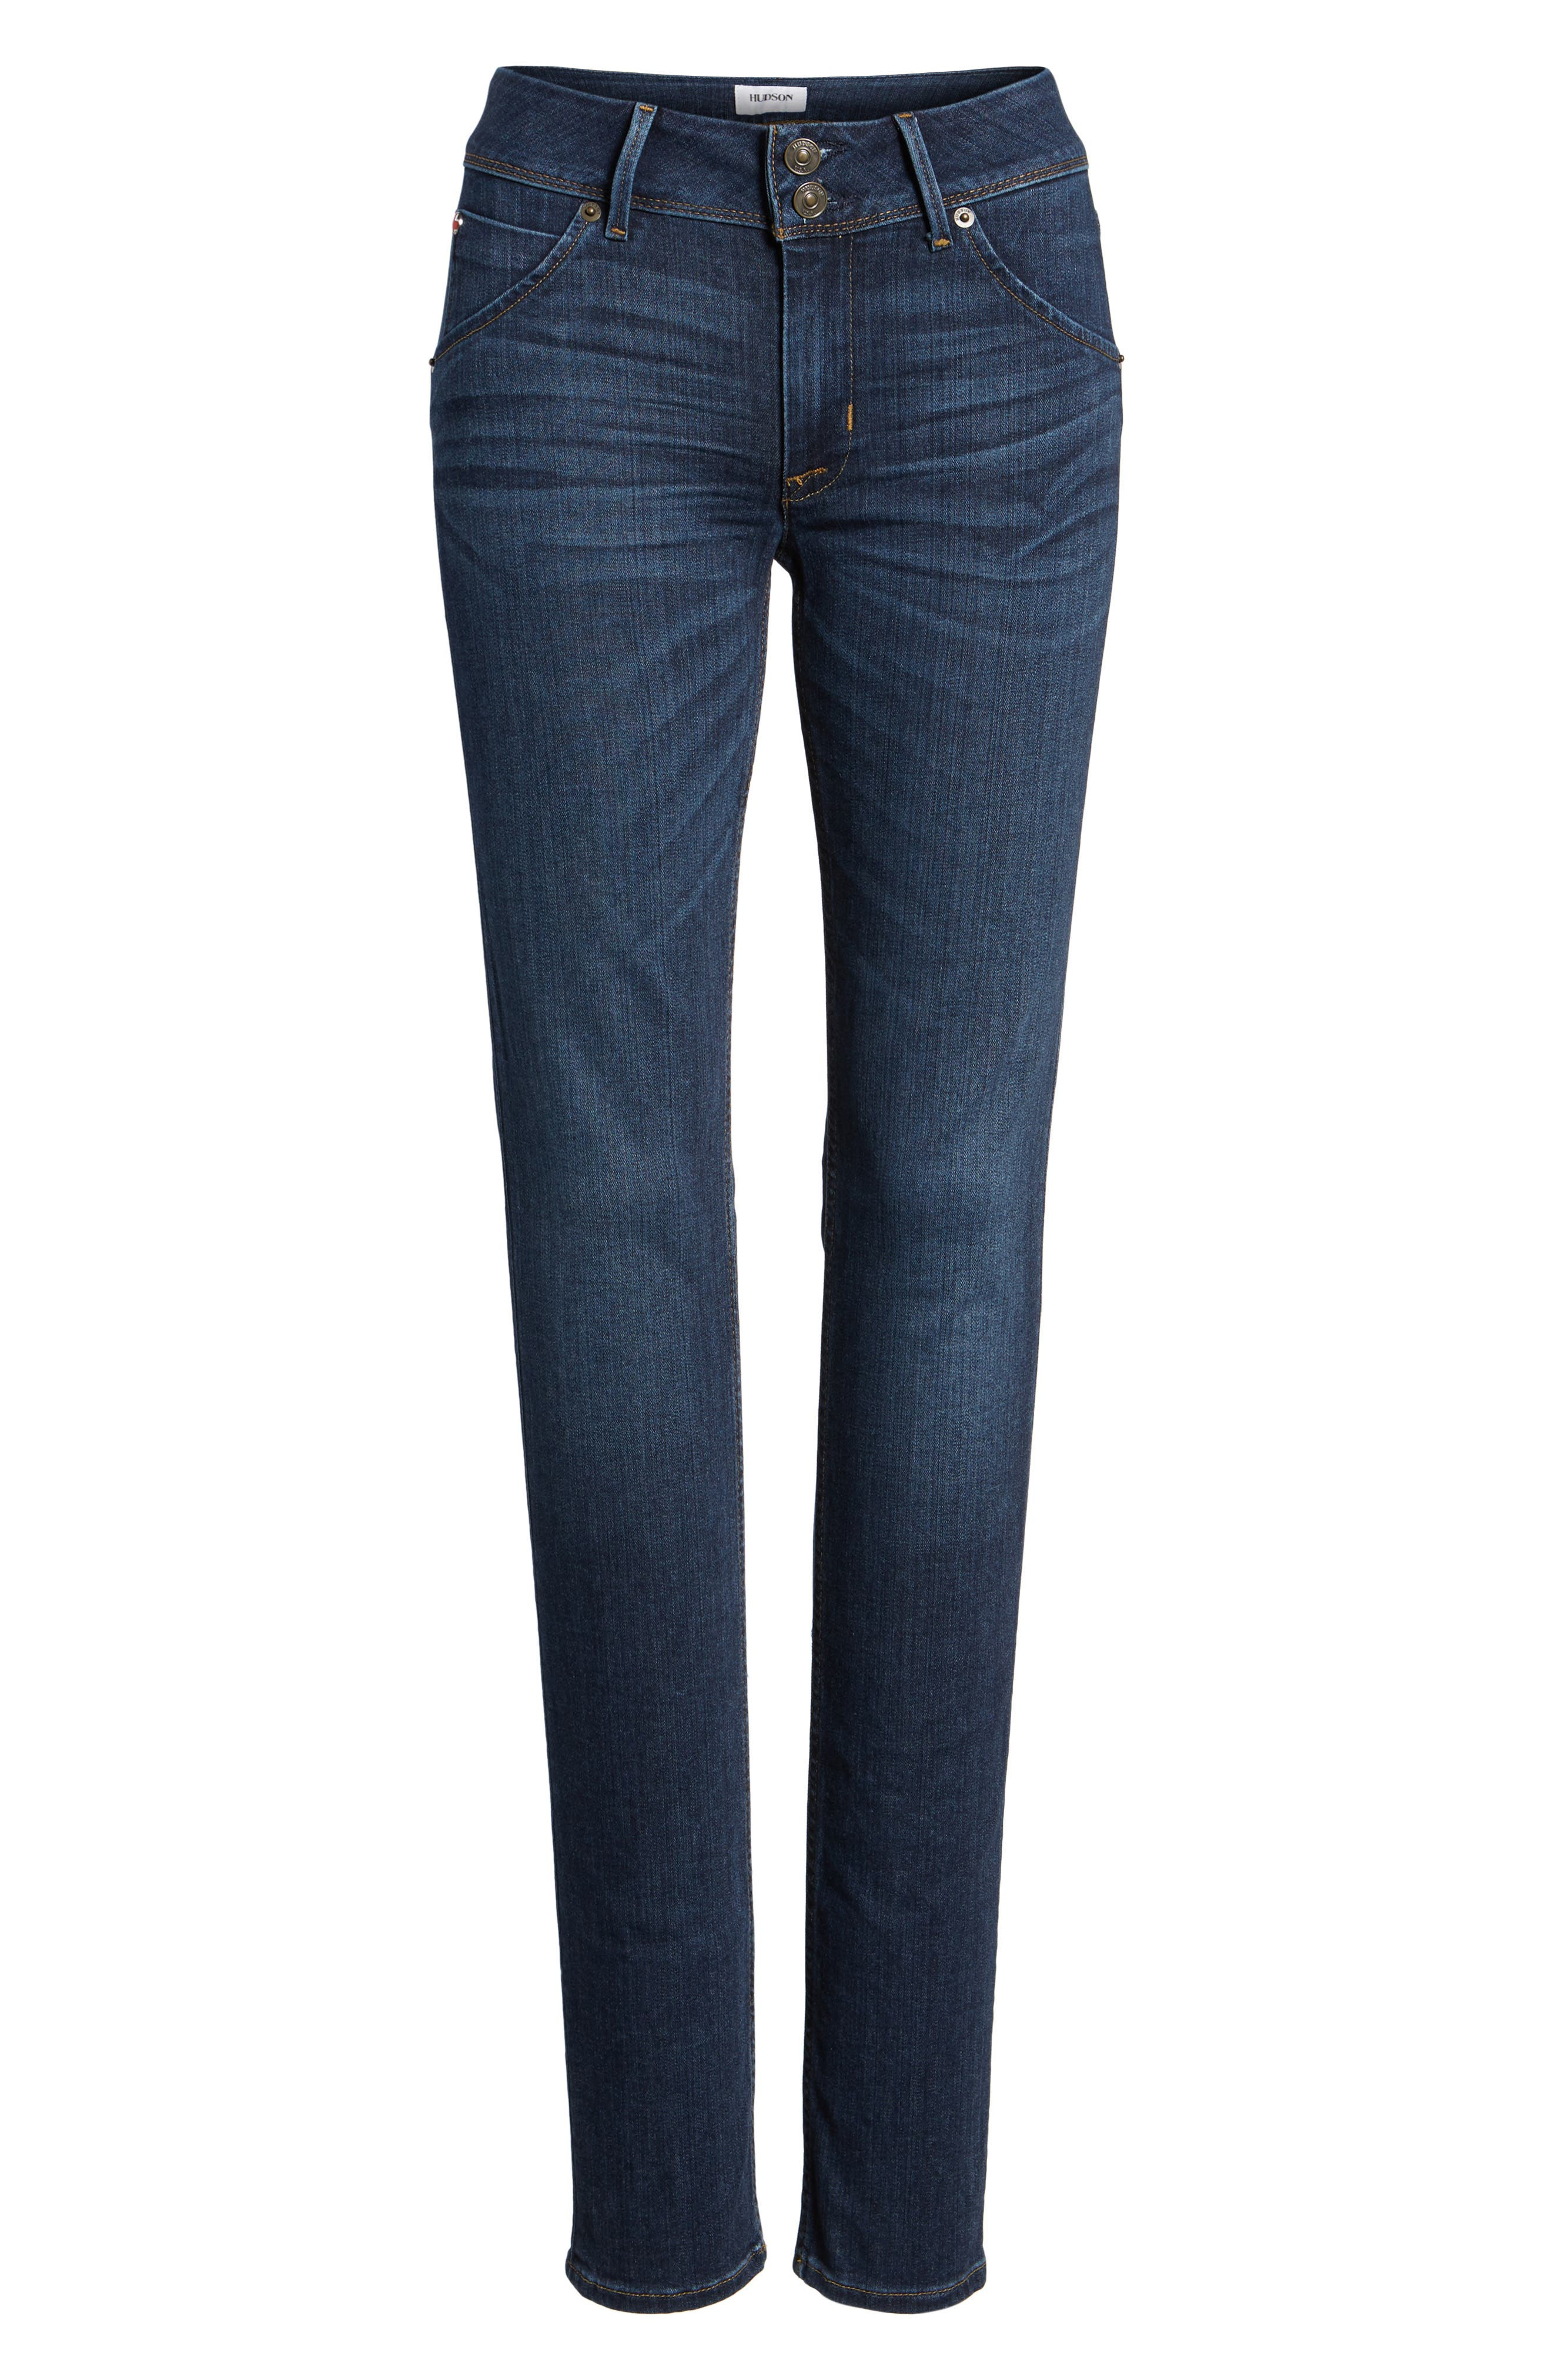 Collin Supermodel Skinny Jeans,                             Alternate thumbnail 6, color,                             422